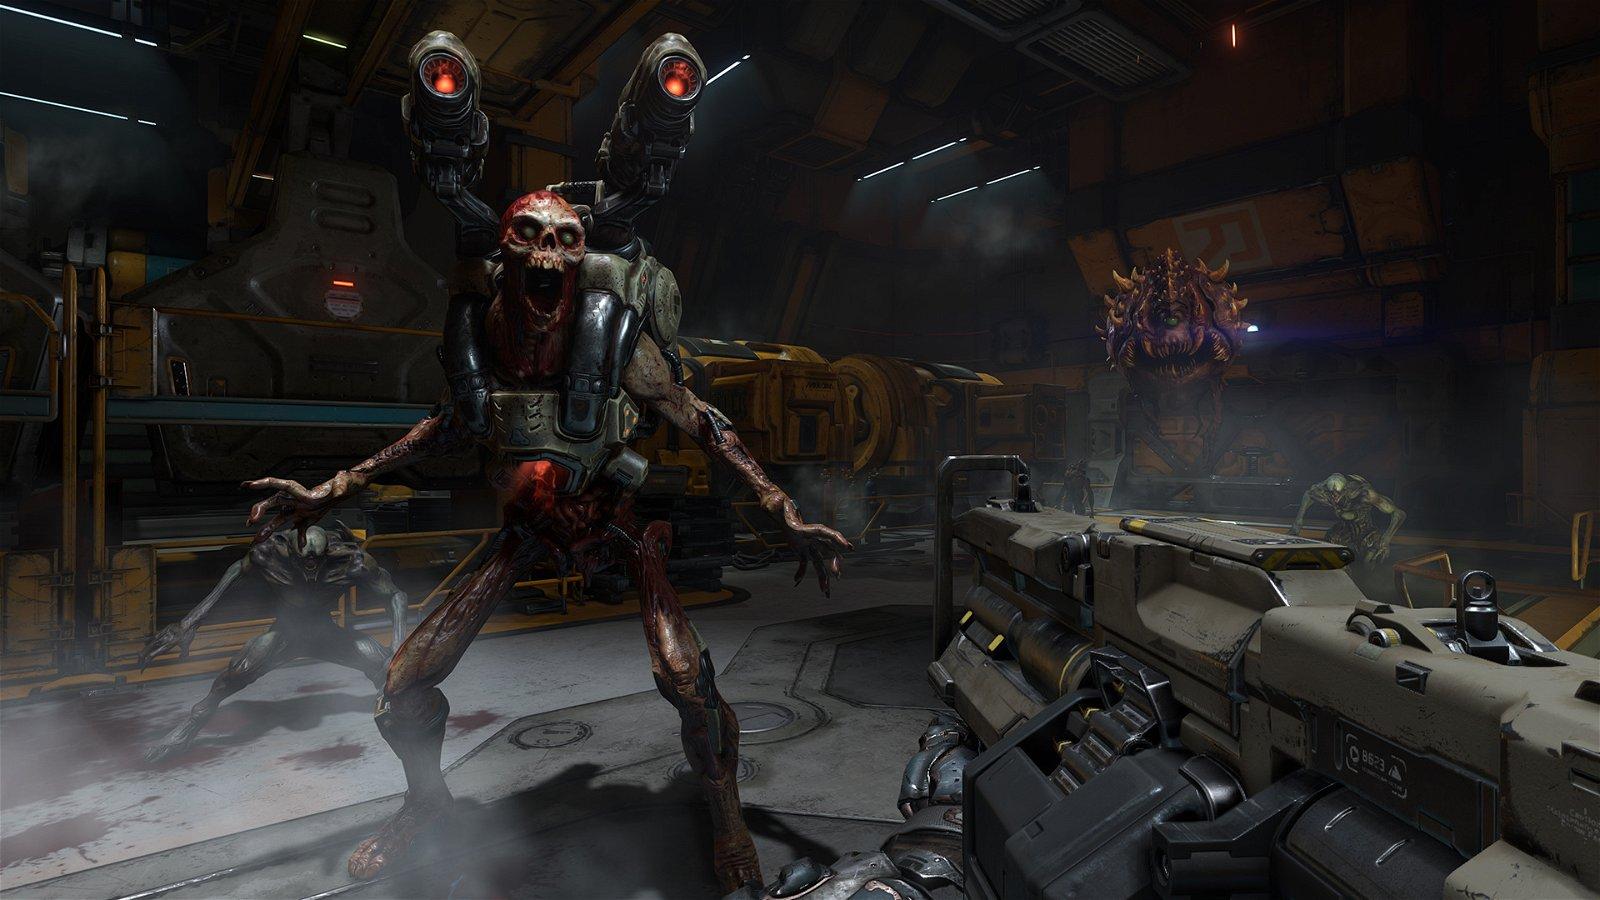 New Screenshots From Doom - 2015-07-24 12:43:59